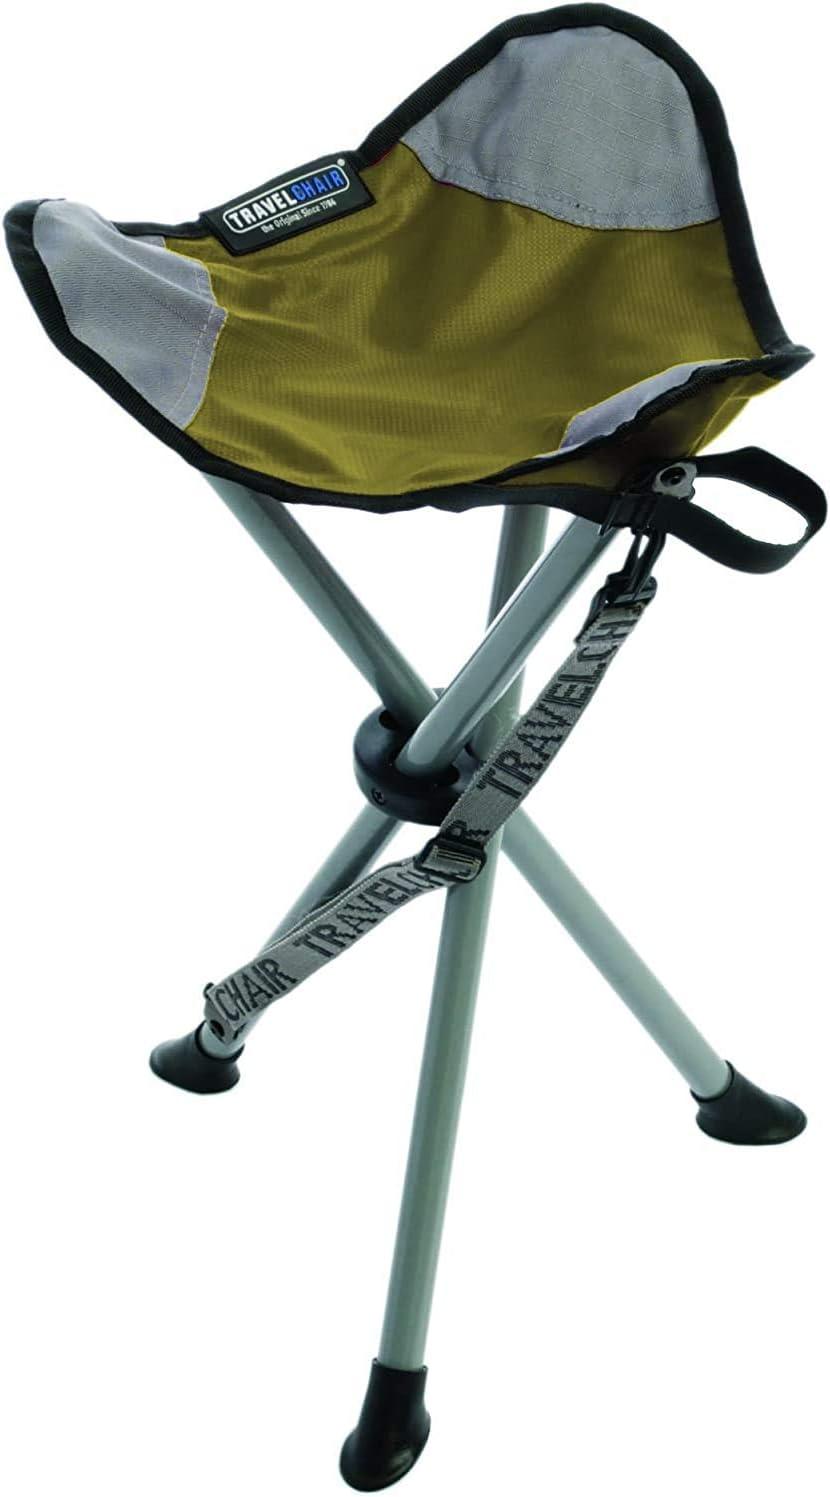 TravelChair Slacker Chair Super Compact Folding Tripod Camping Stool